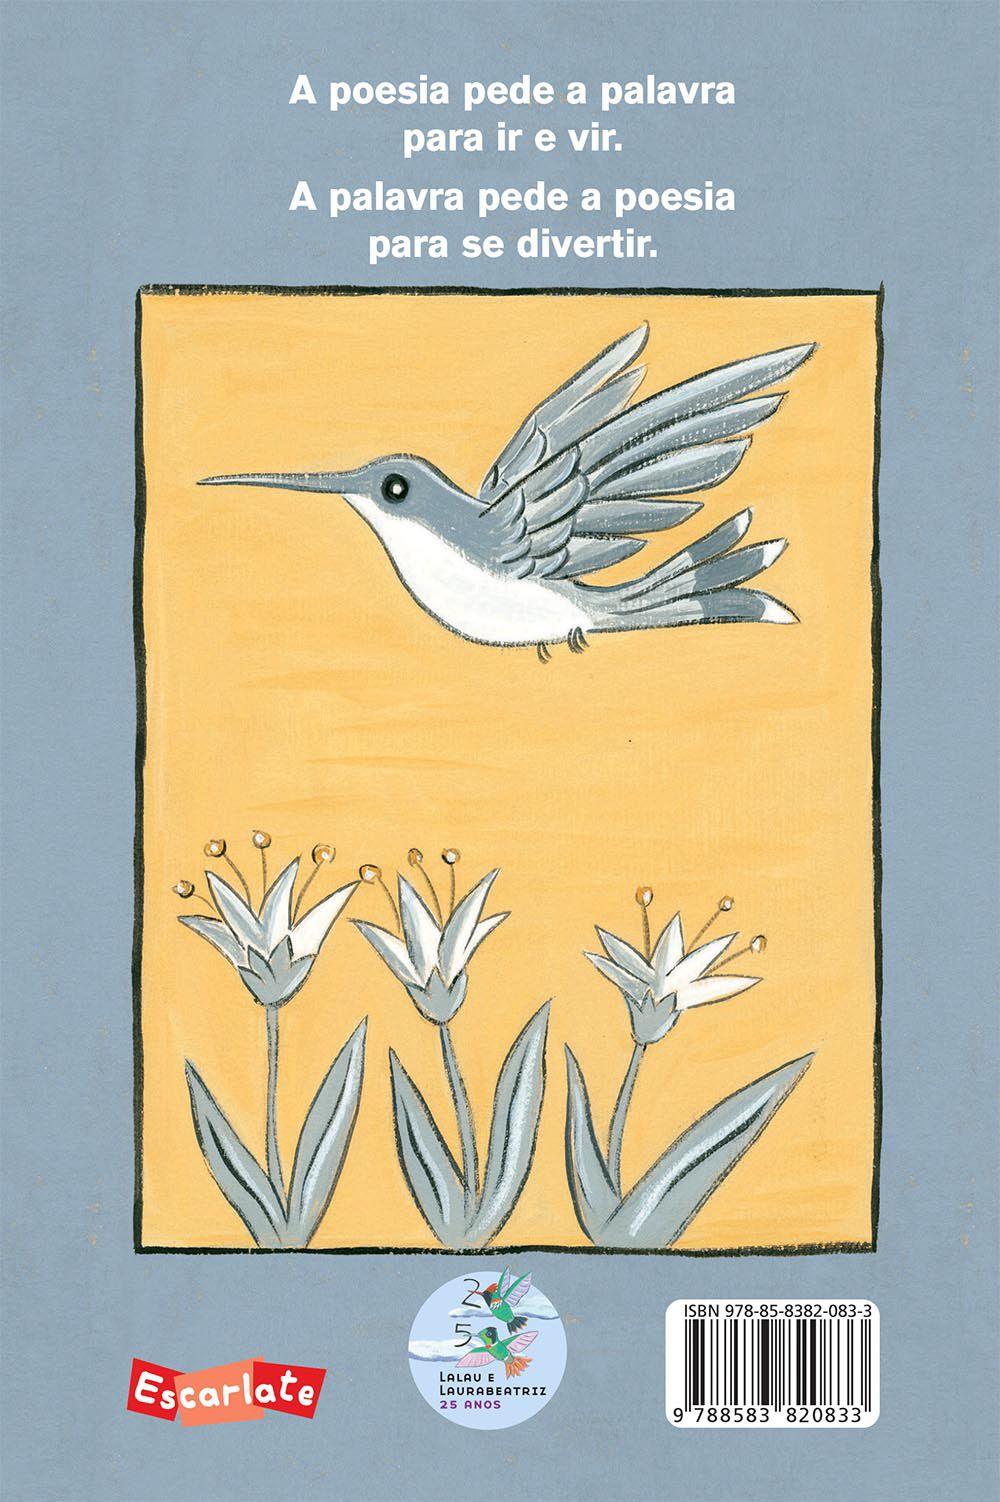 A poesia pede a palavra  - Grupo Brinque-Book